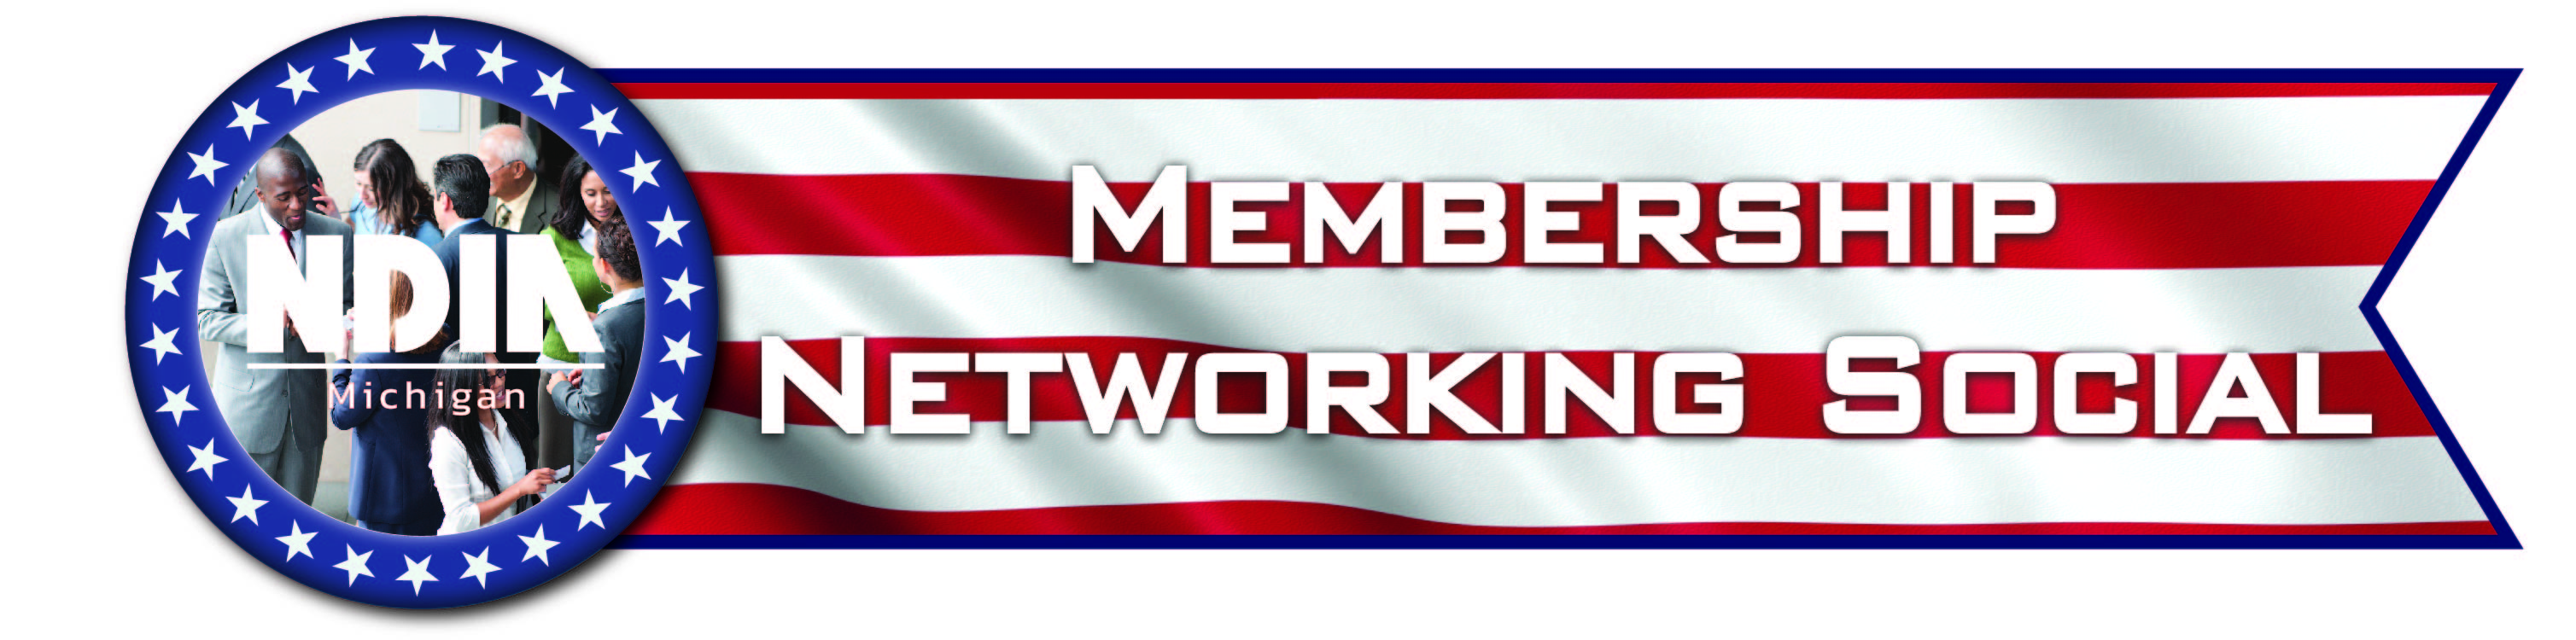 Membership Networking Social